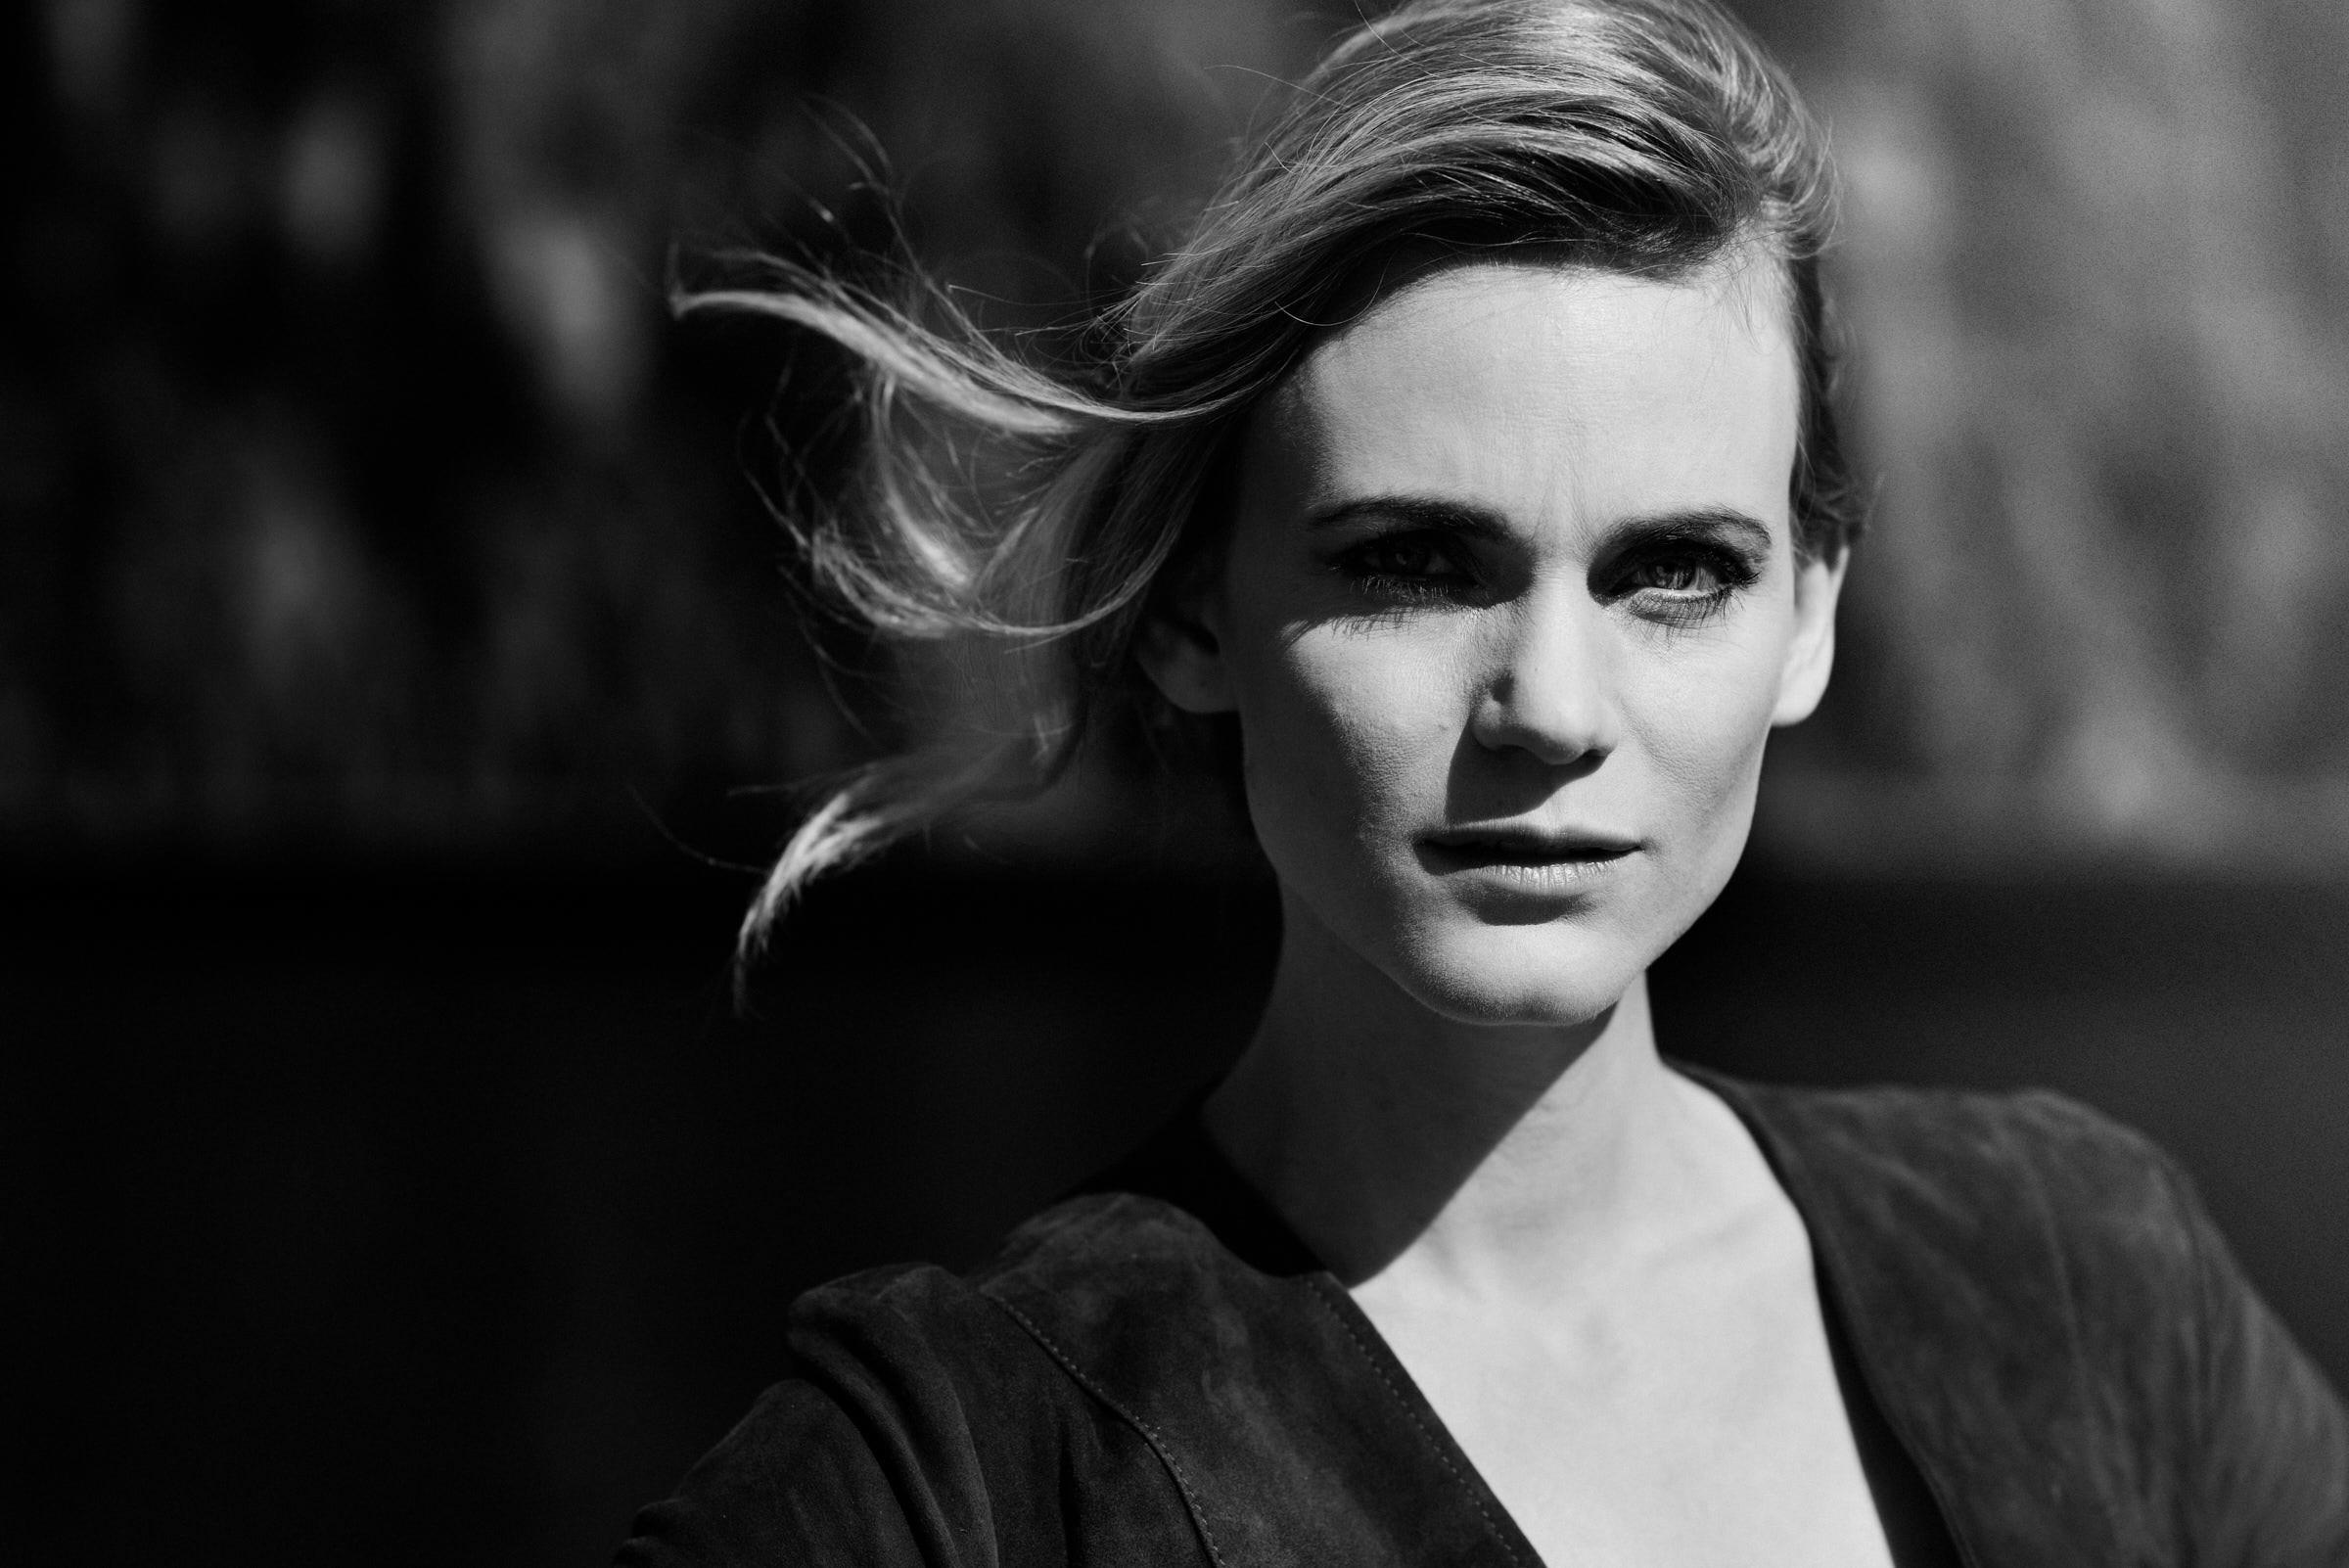 Portfolio_468_Portrait of Liv Mjönes_Highres__DSC4426__KRISTOFER SAMUELSSON PHOTOGRAPHY.jpg